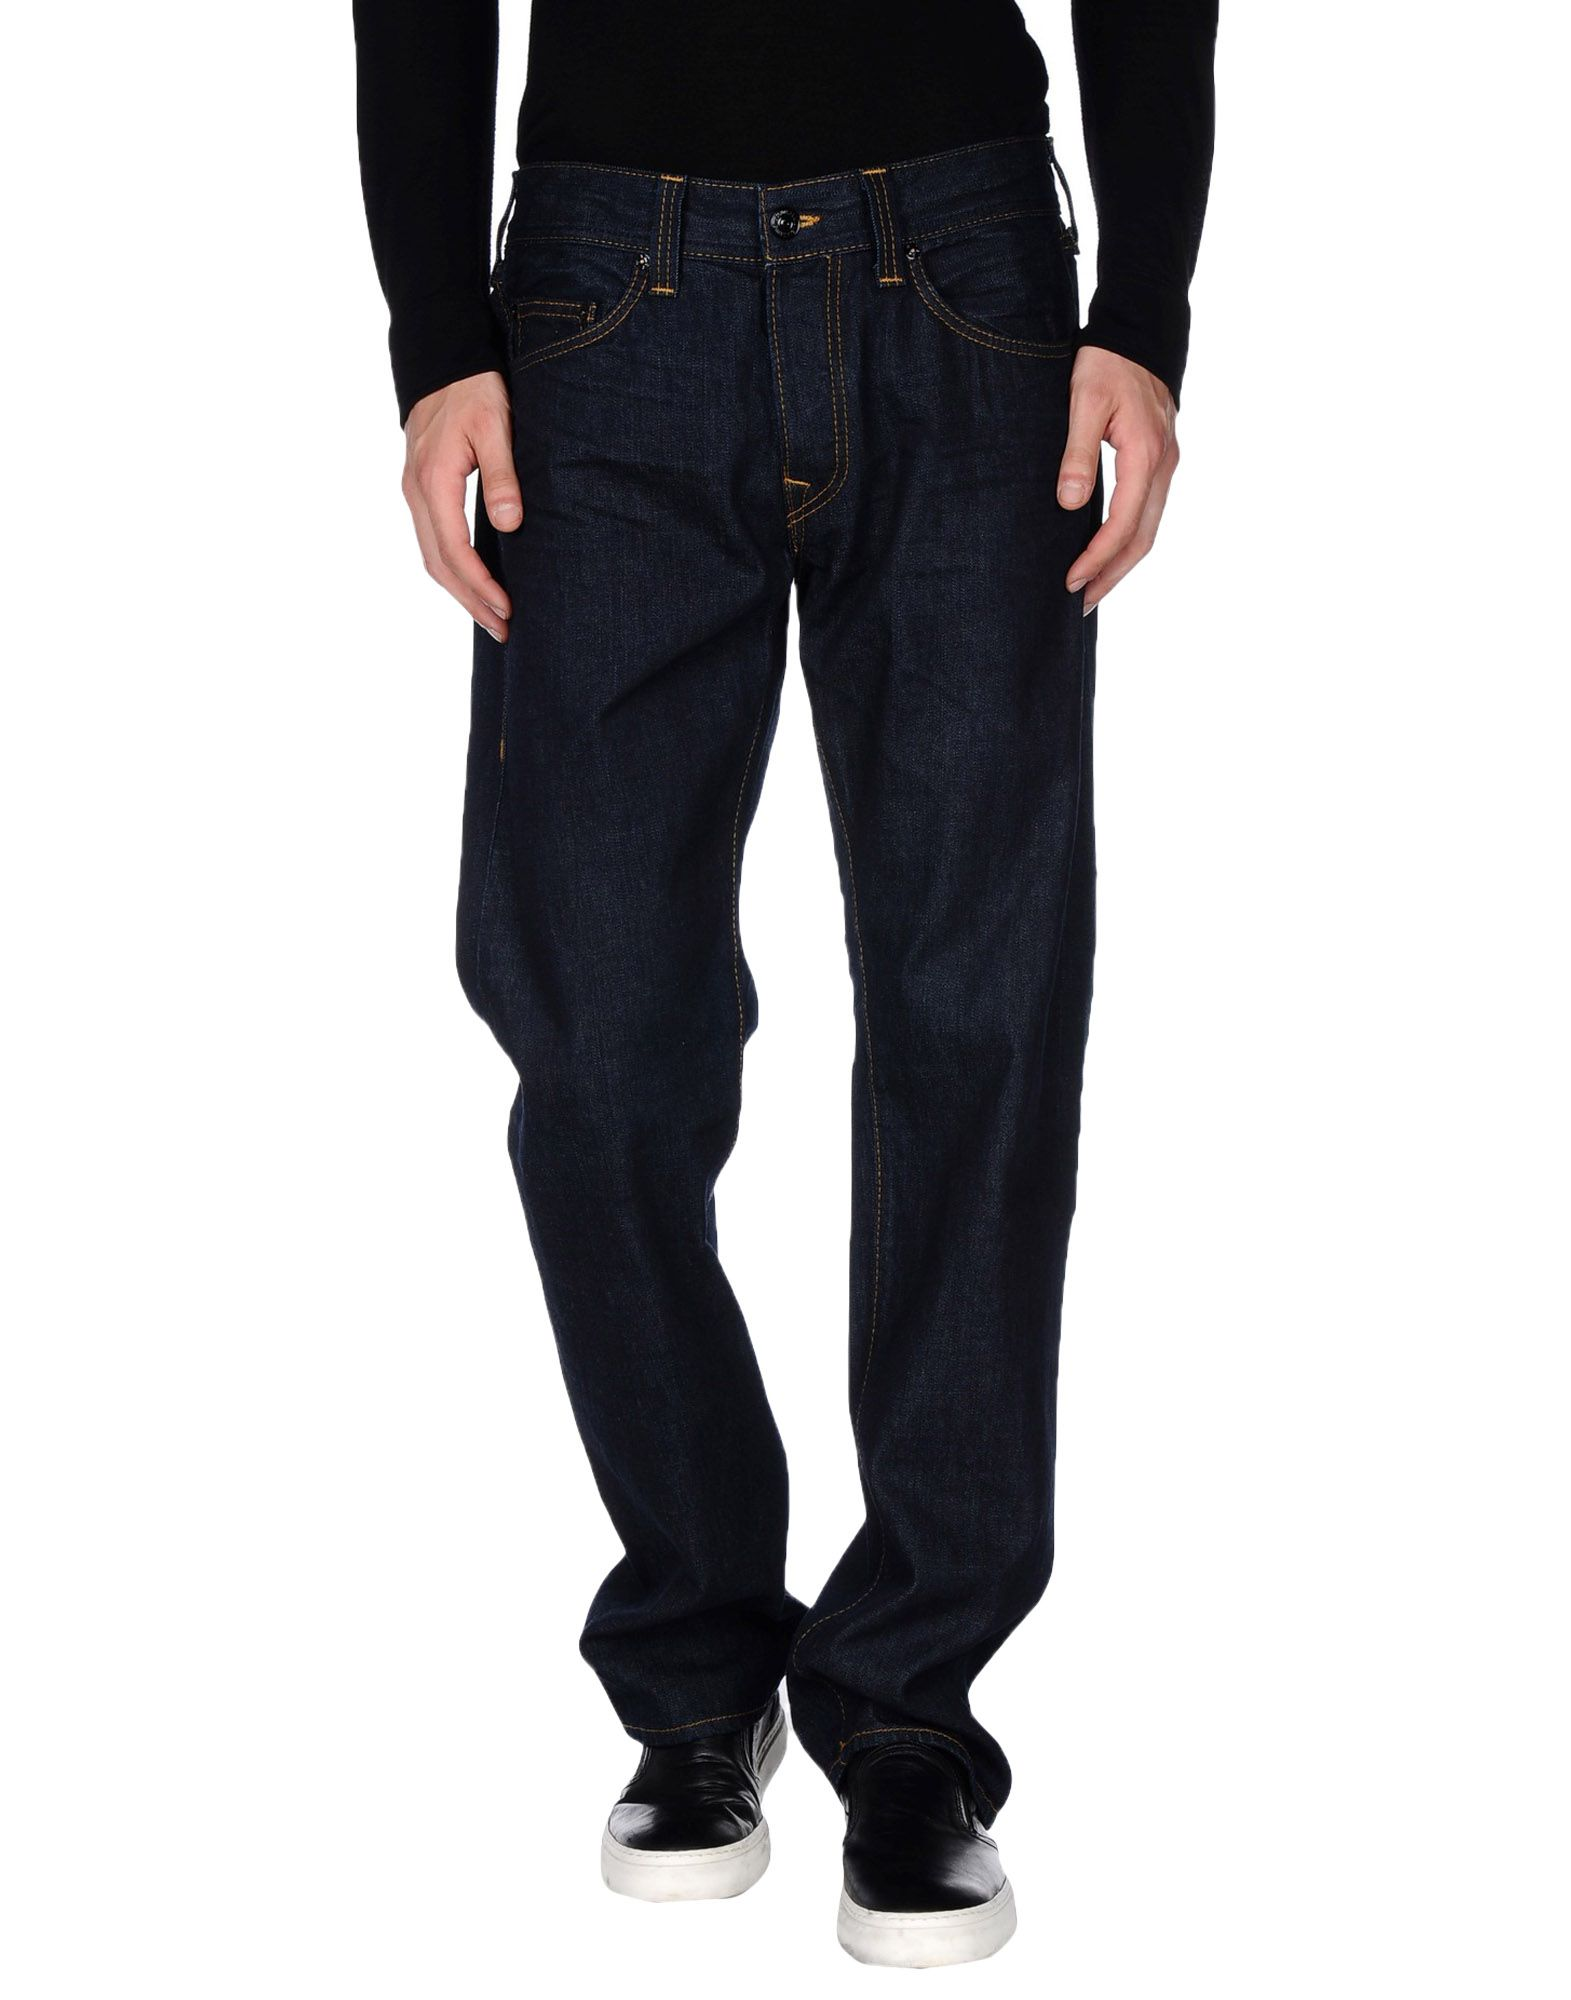 Pantaloni Jeans True Religion Uomo - Acquista online su